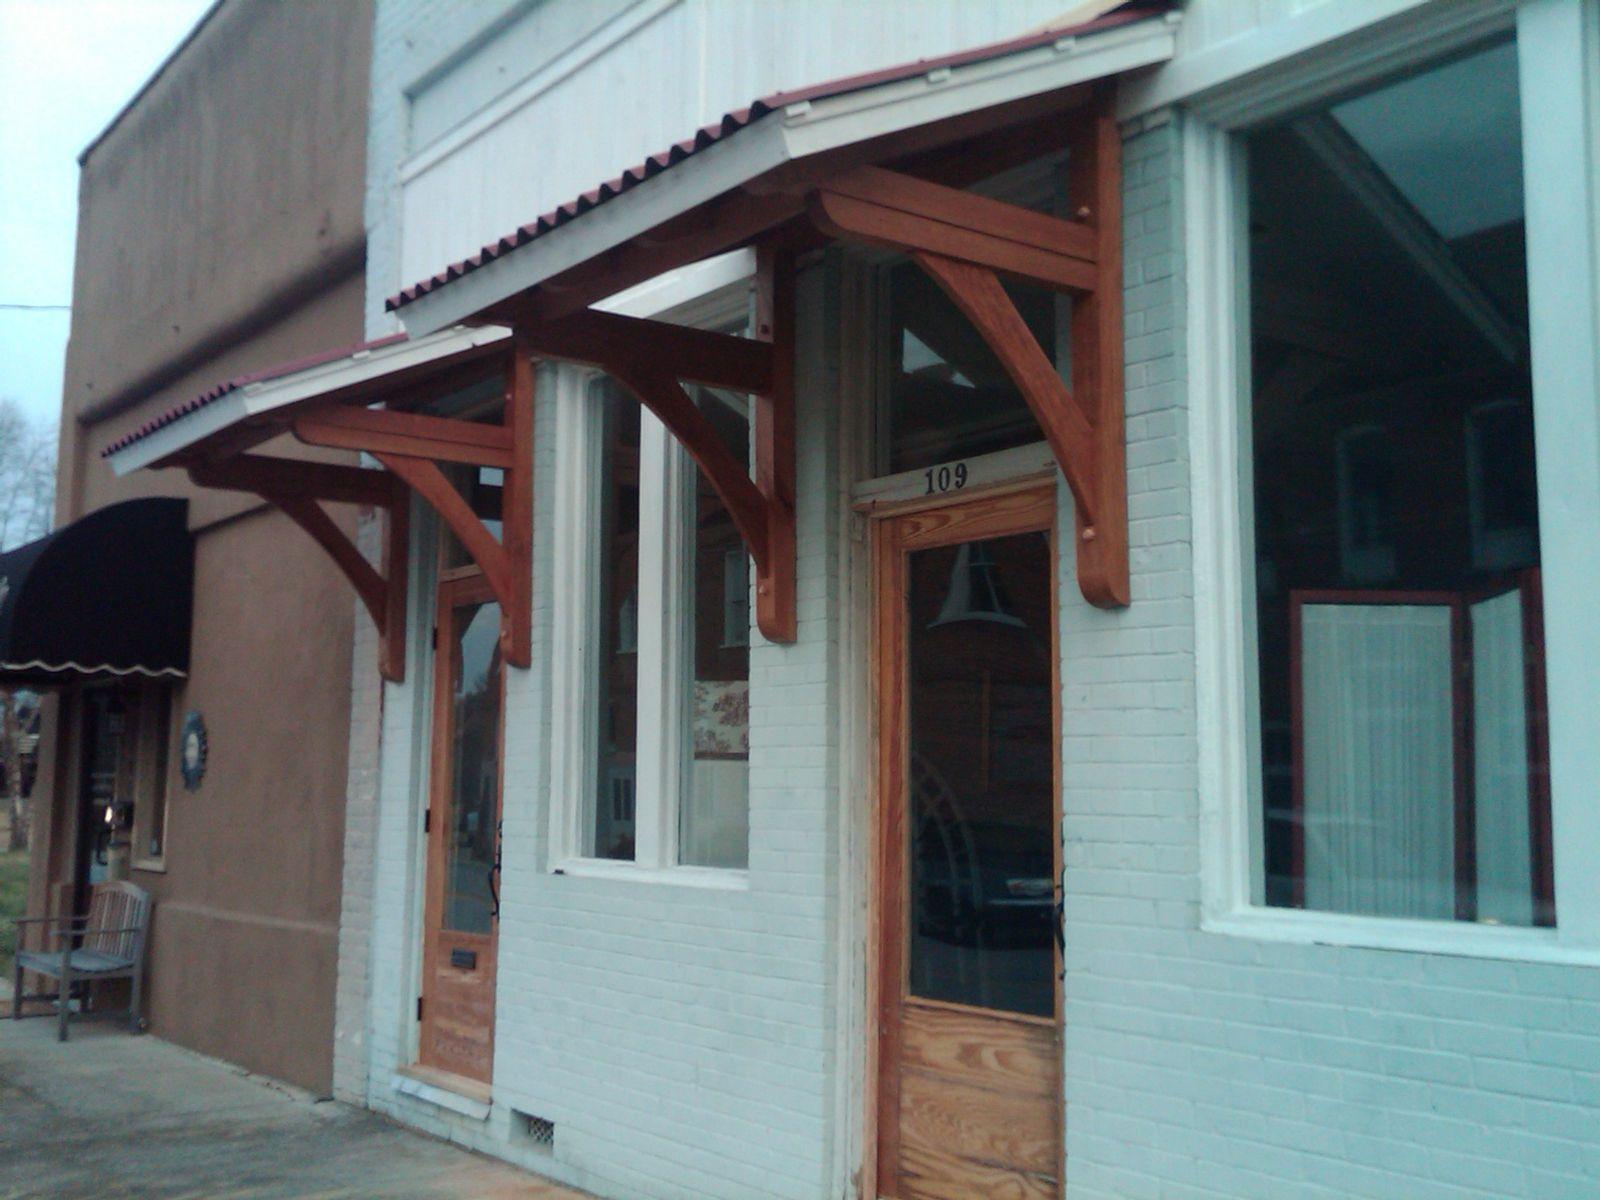 Handmade Office Door Awnings by Moresun Custom Woodworking ...